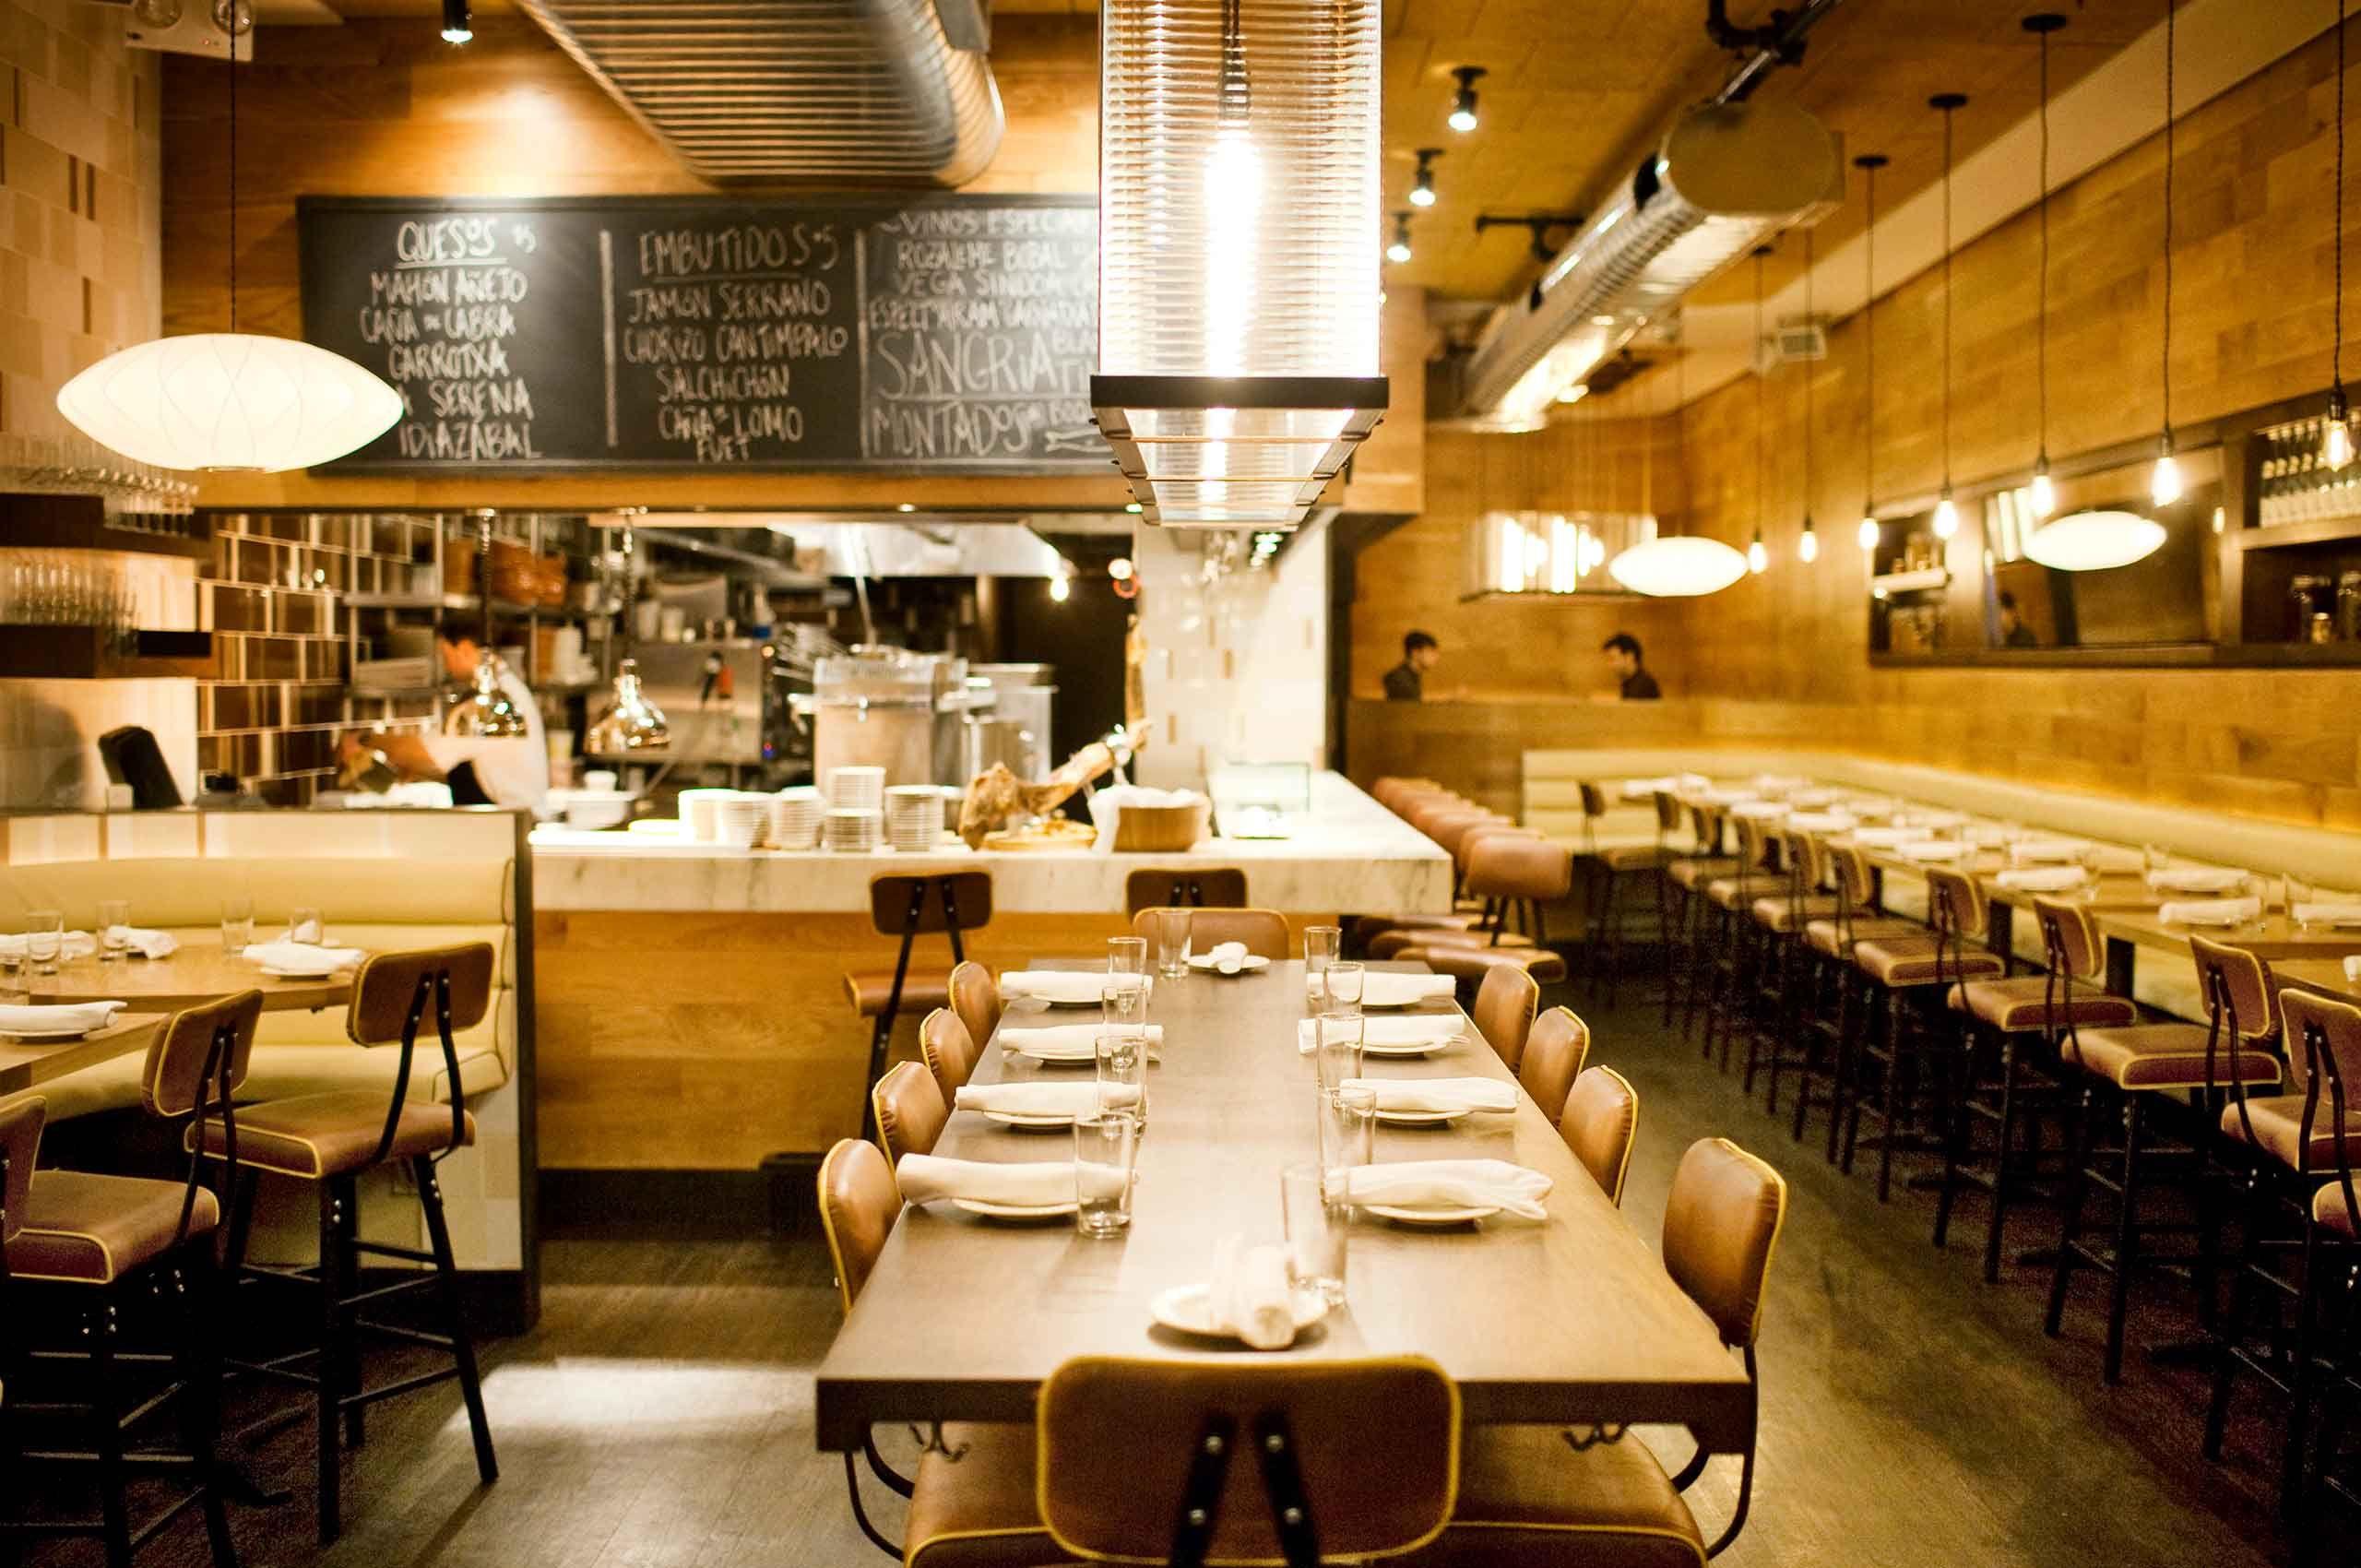 NewYorkRestaurant-Interior-by-HenrikOlundPhotography.jpg